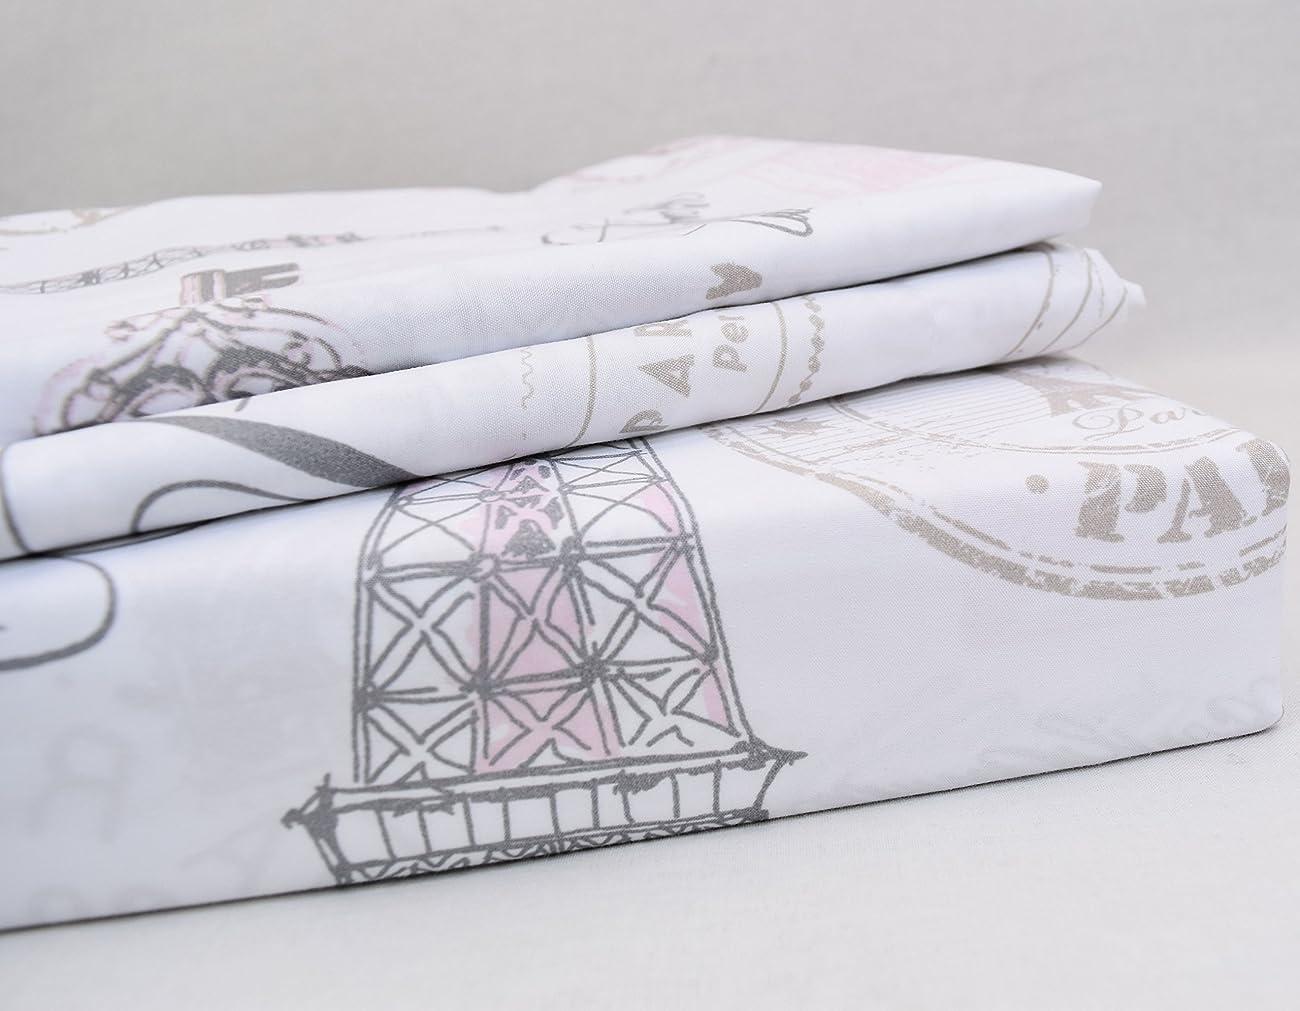 Paris French Vintage Duvet Quilt Cover by Designer Nicole Miller, Bedding Set Grey Tan Dusty Rose Pink Eiffel Script Parisian Theme on White (Queen) 2